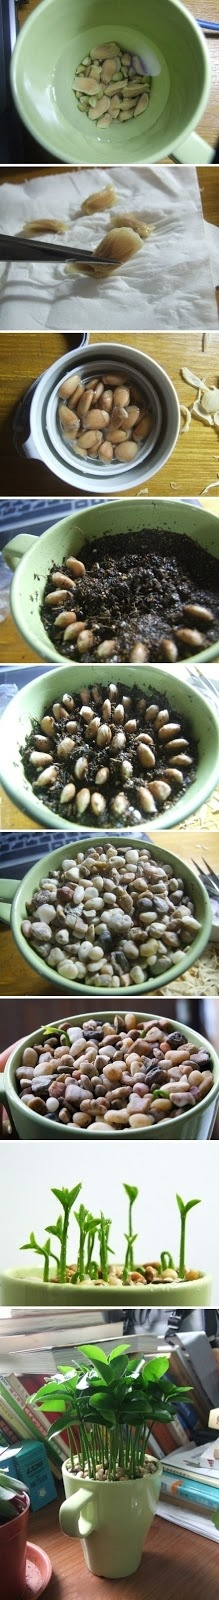 Tips para mujeres: Planta semillas de limón